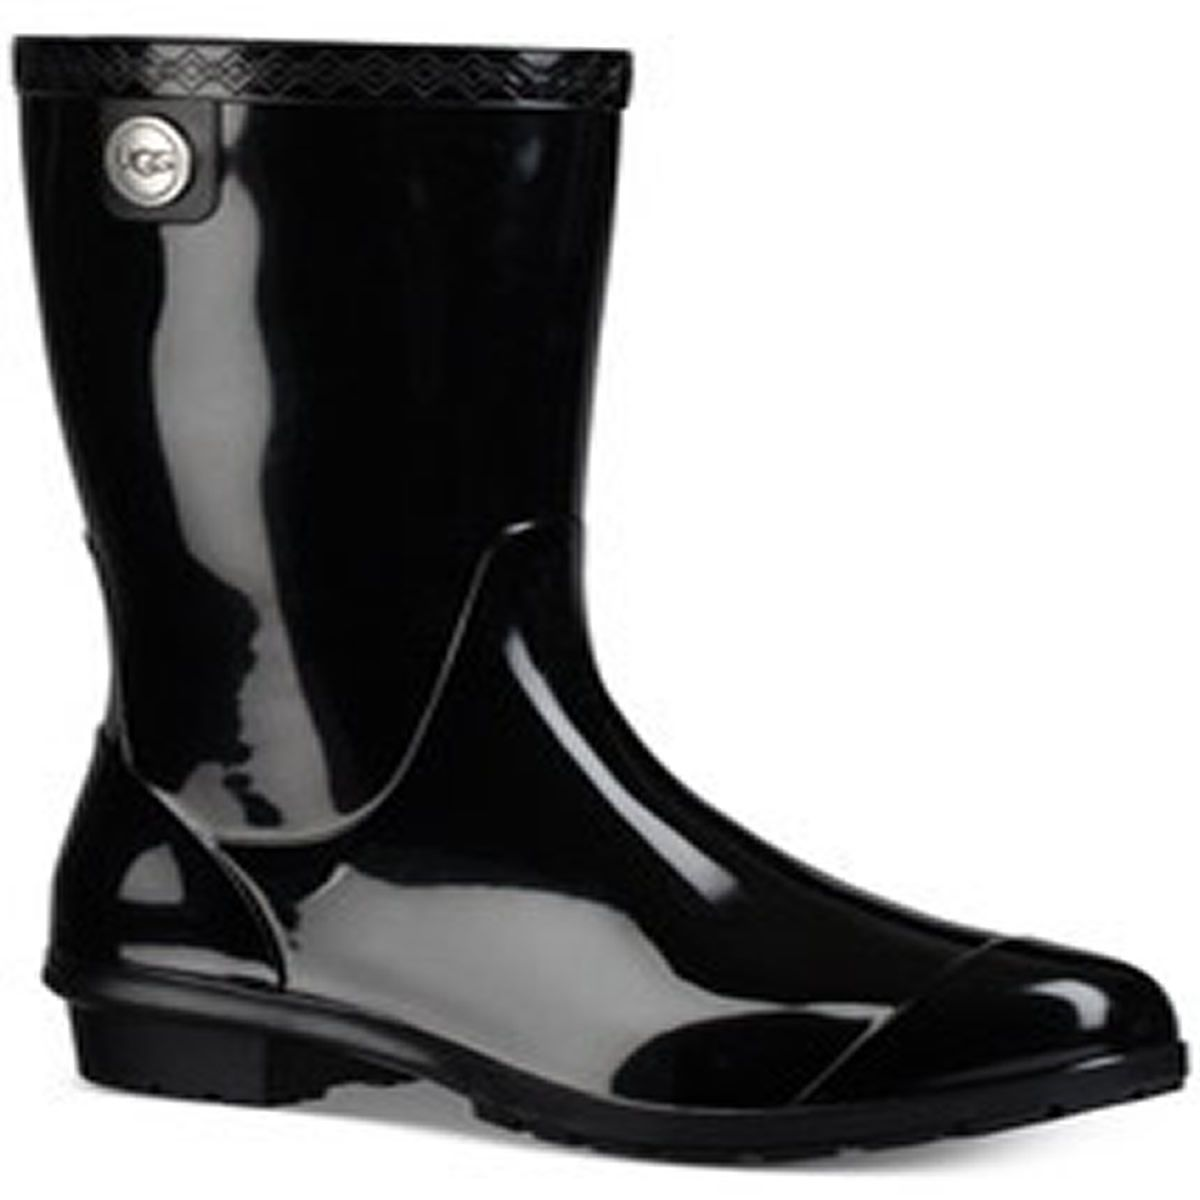 df1c8d2c28a Waterproof UGG Shoes - Macy's